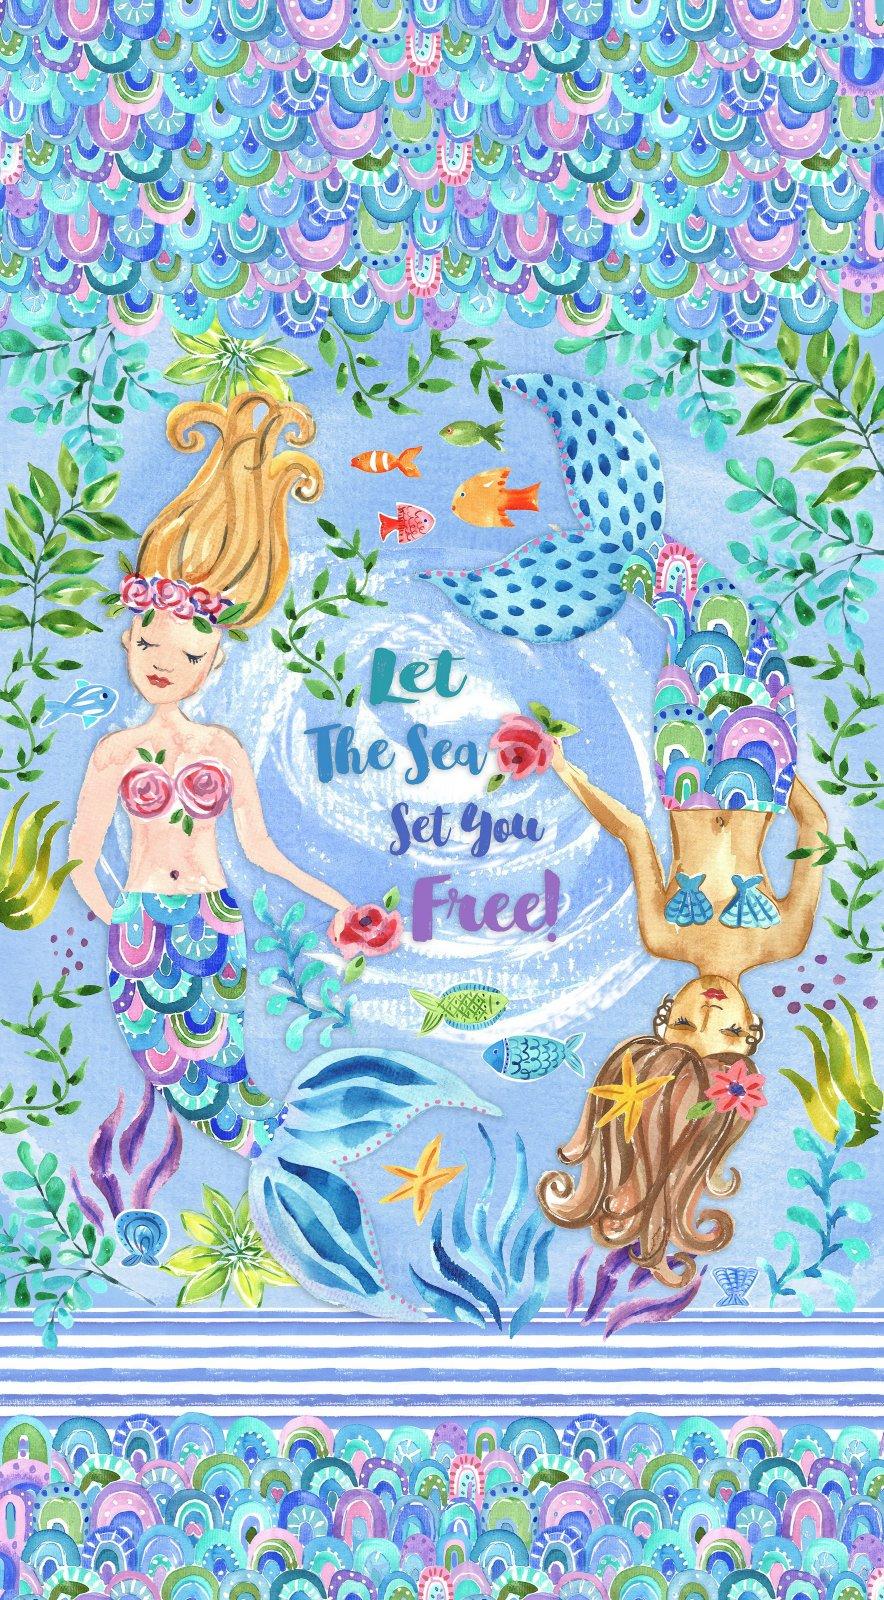 SF-Let the Sea Set You Free 10419 Mermaid Panel